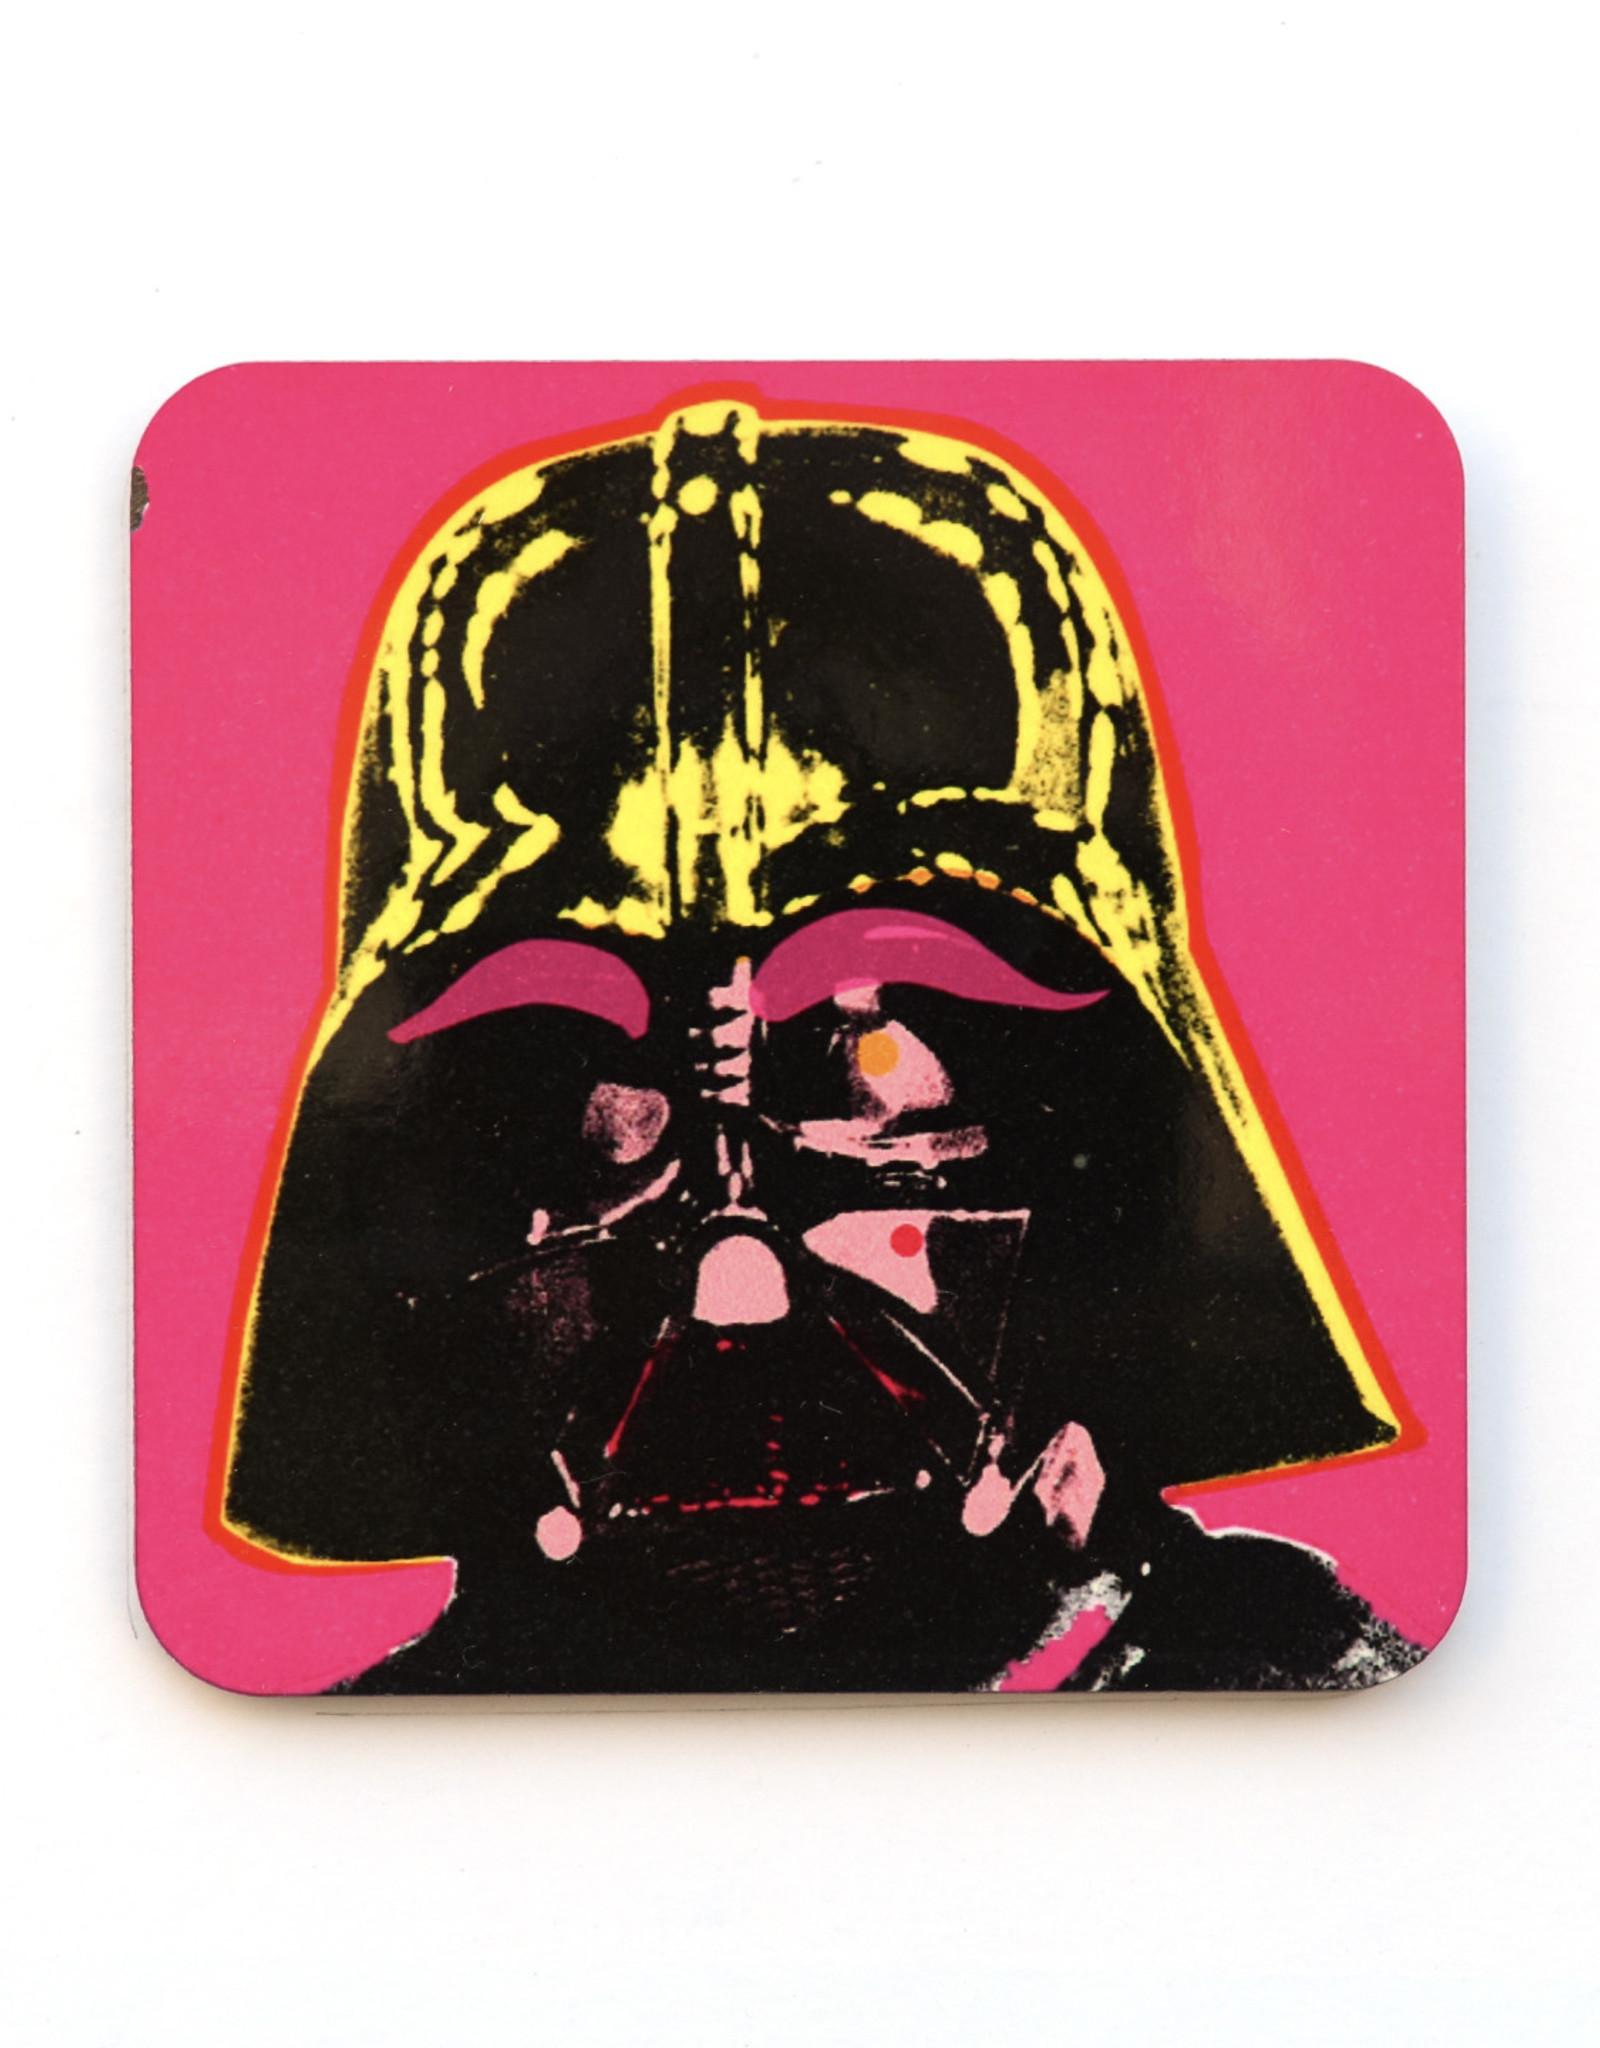 Pink Darth Vader Coaster